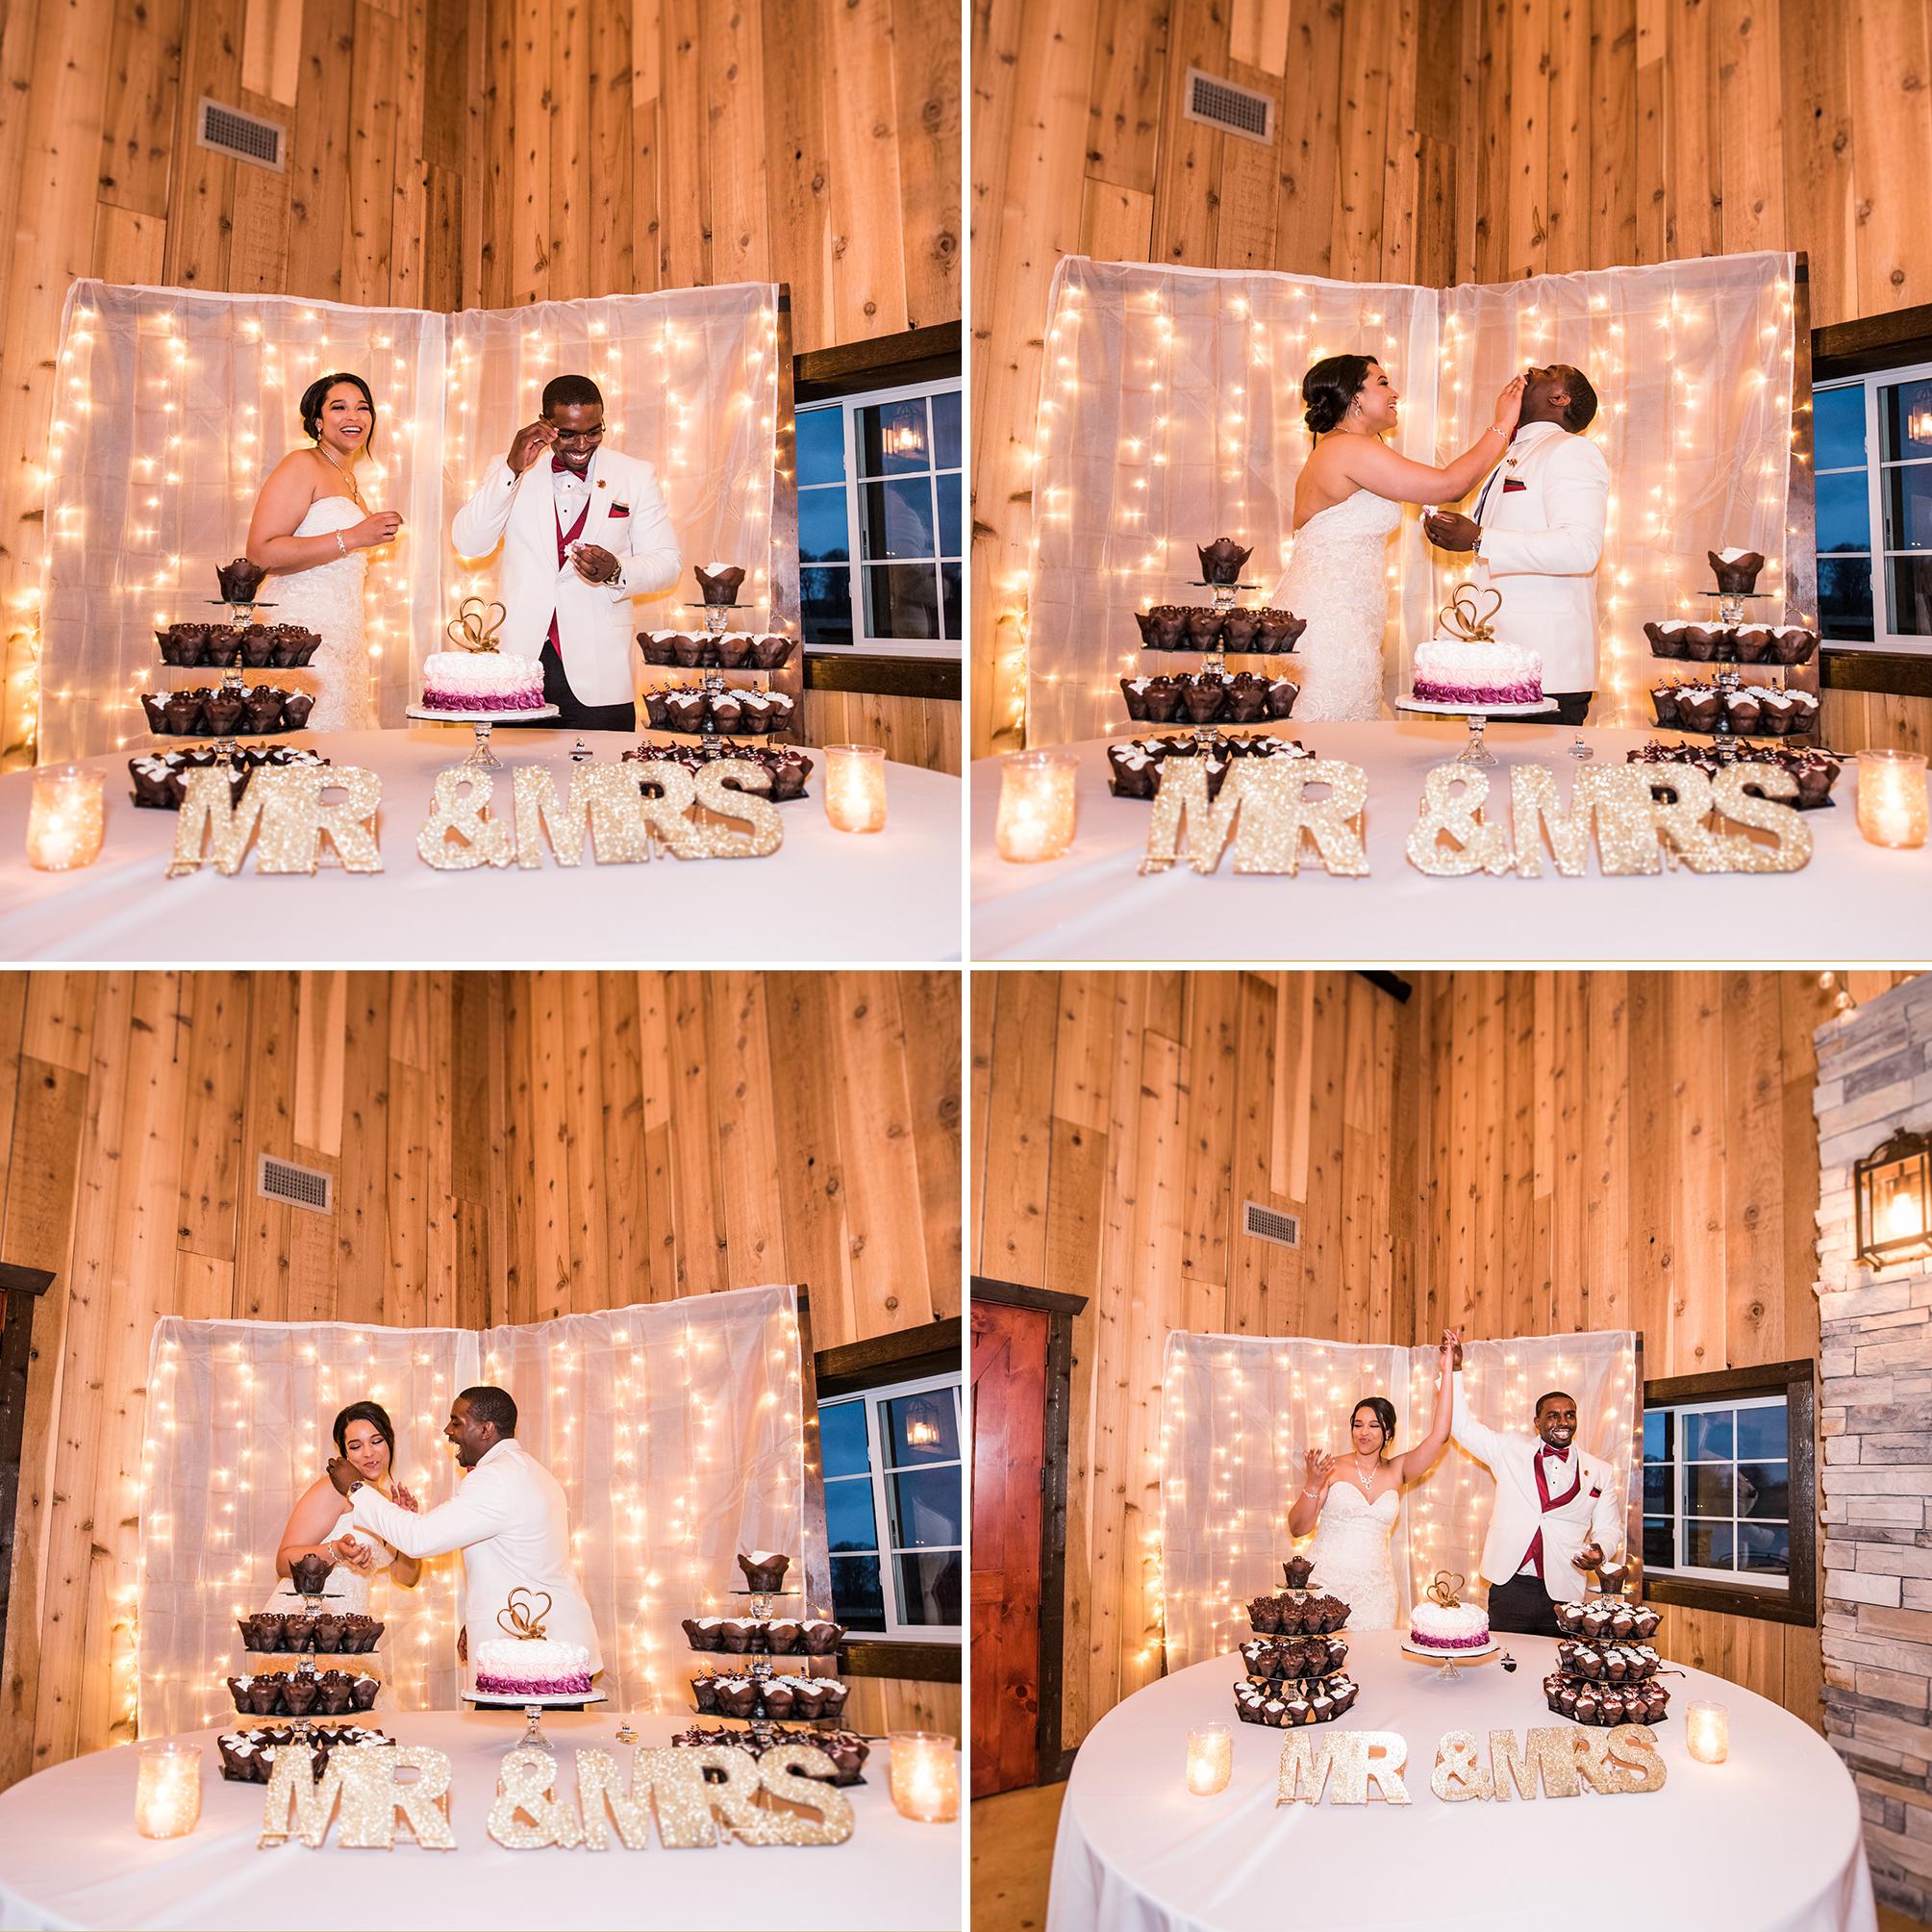 Burlington Iowa Wedding Midwest Photographer Melissa Cervantes _ Chantelle and Isaiah 2017.jpg